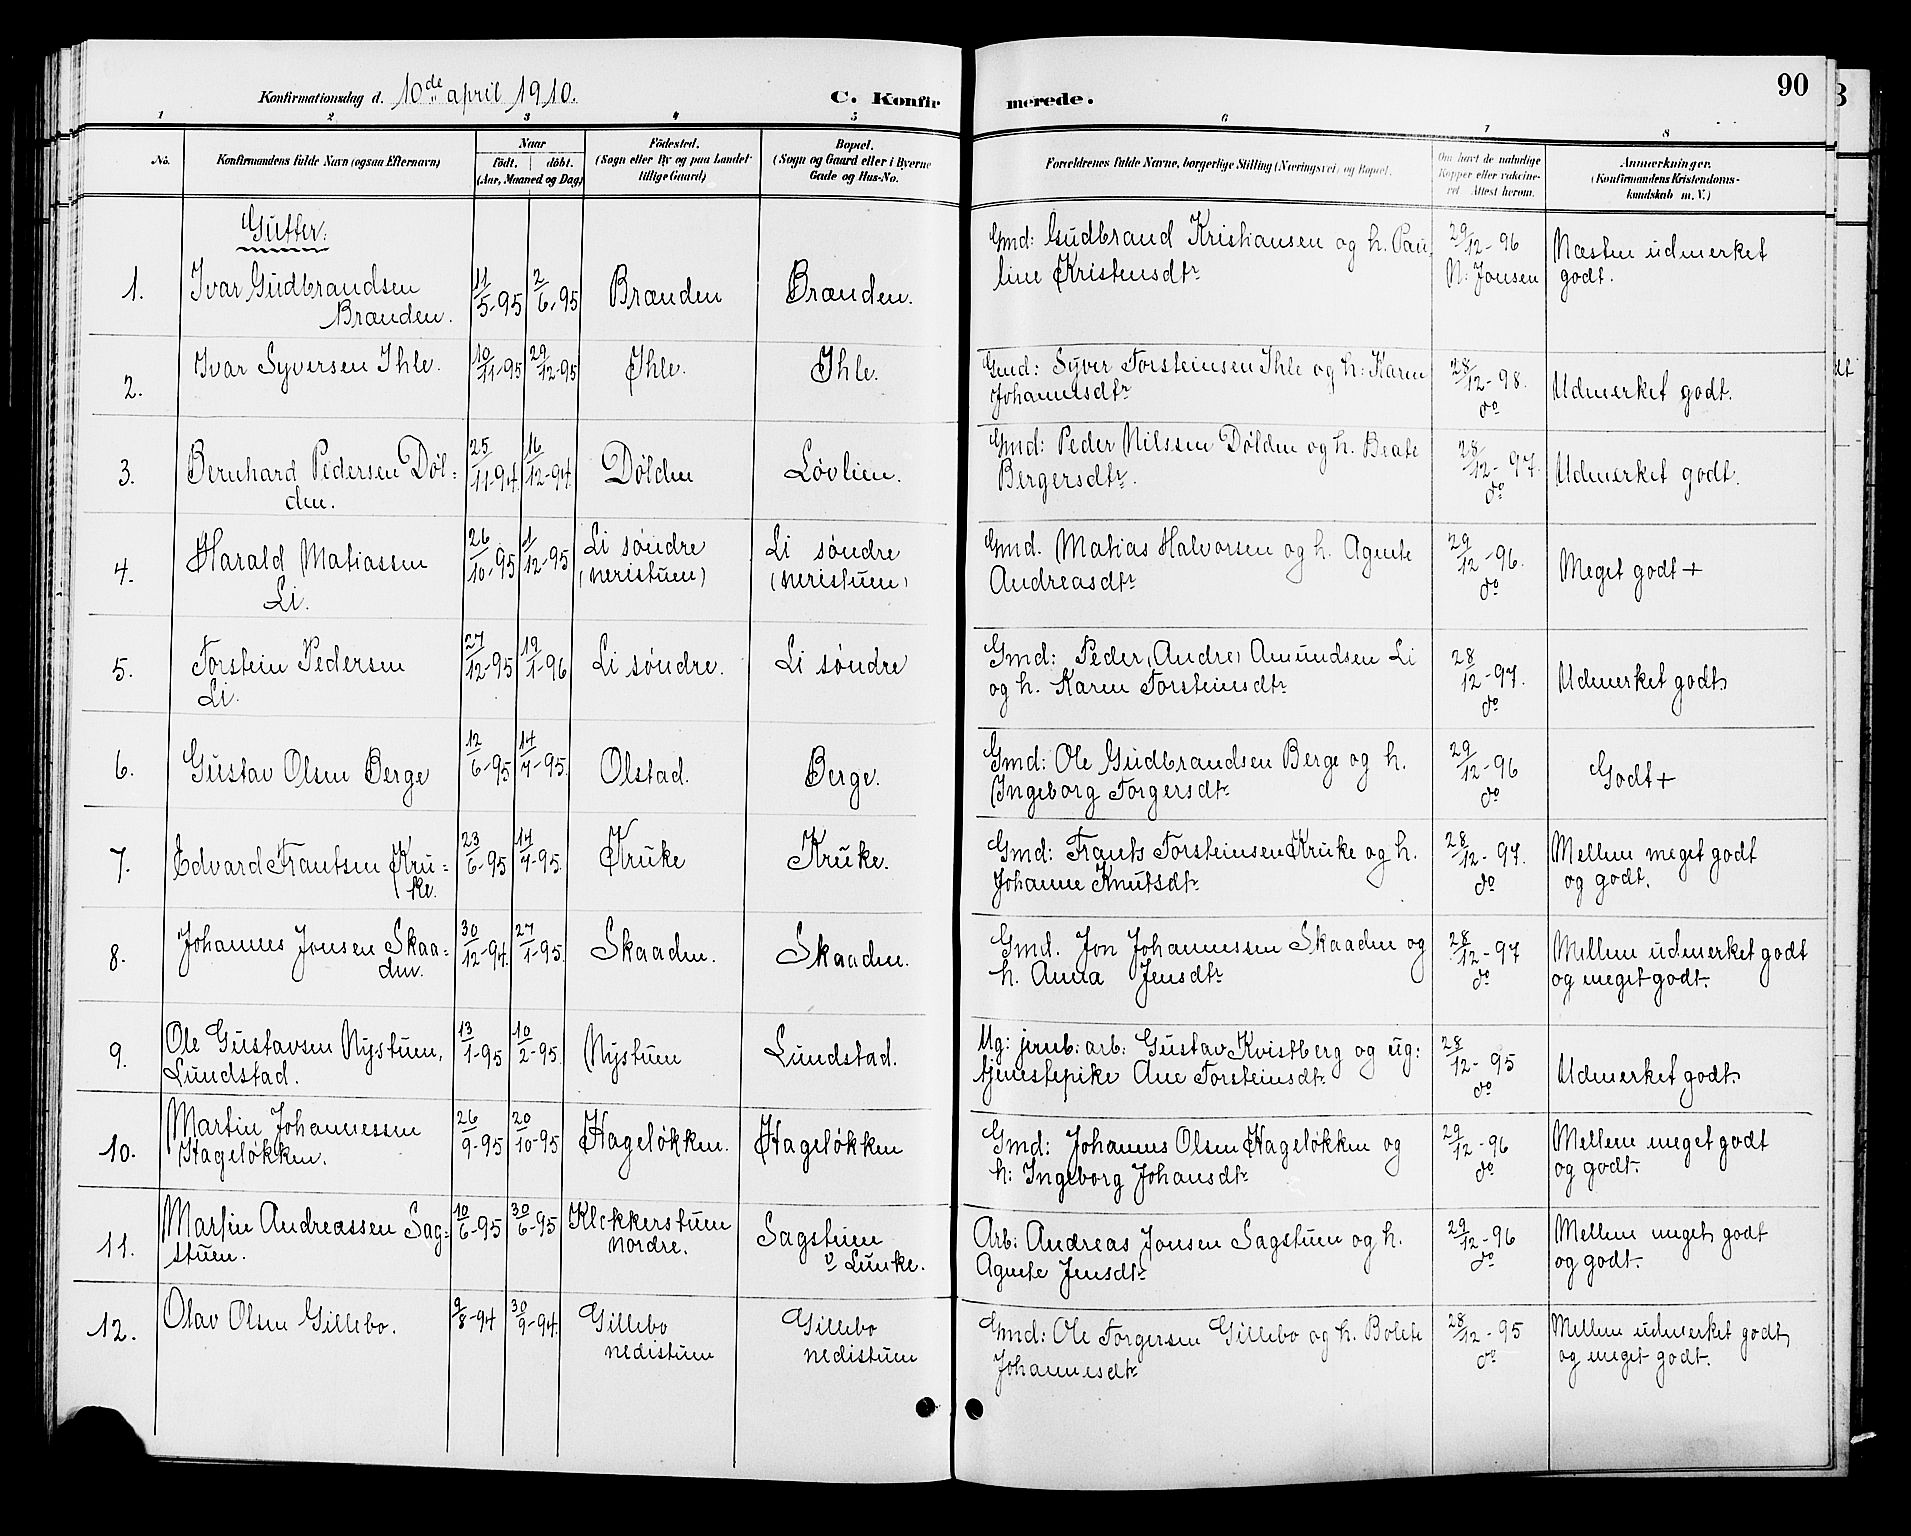 SAH, Øyer prestekontor, Klokkerbok nr. 5, 1897-1913, s. 90